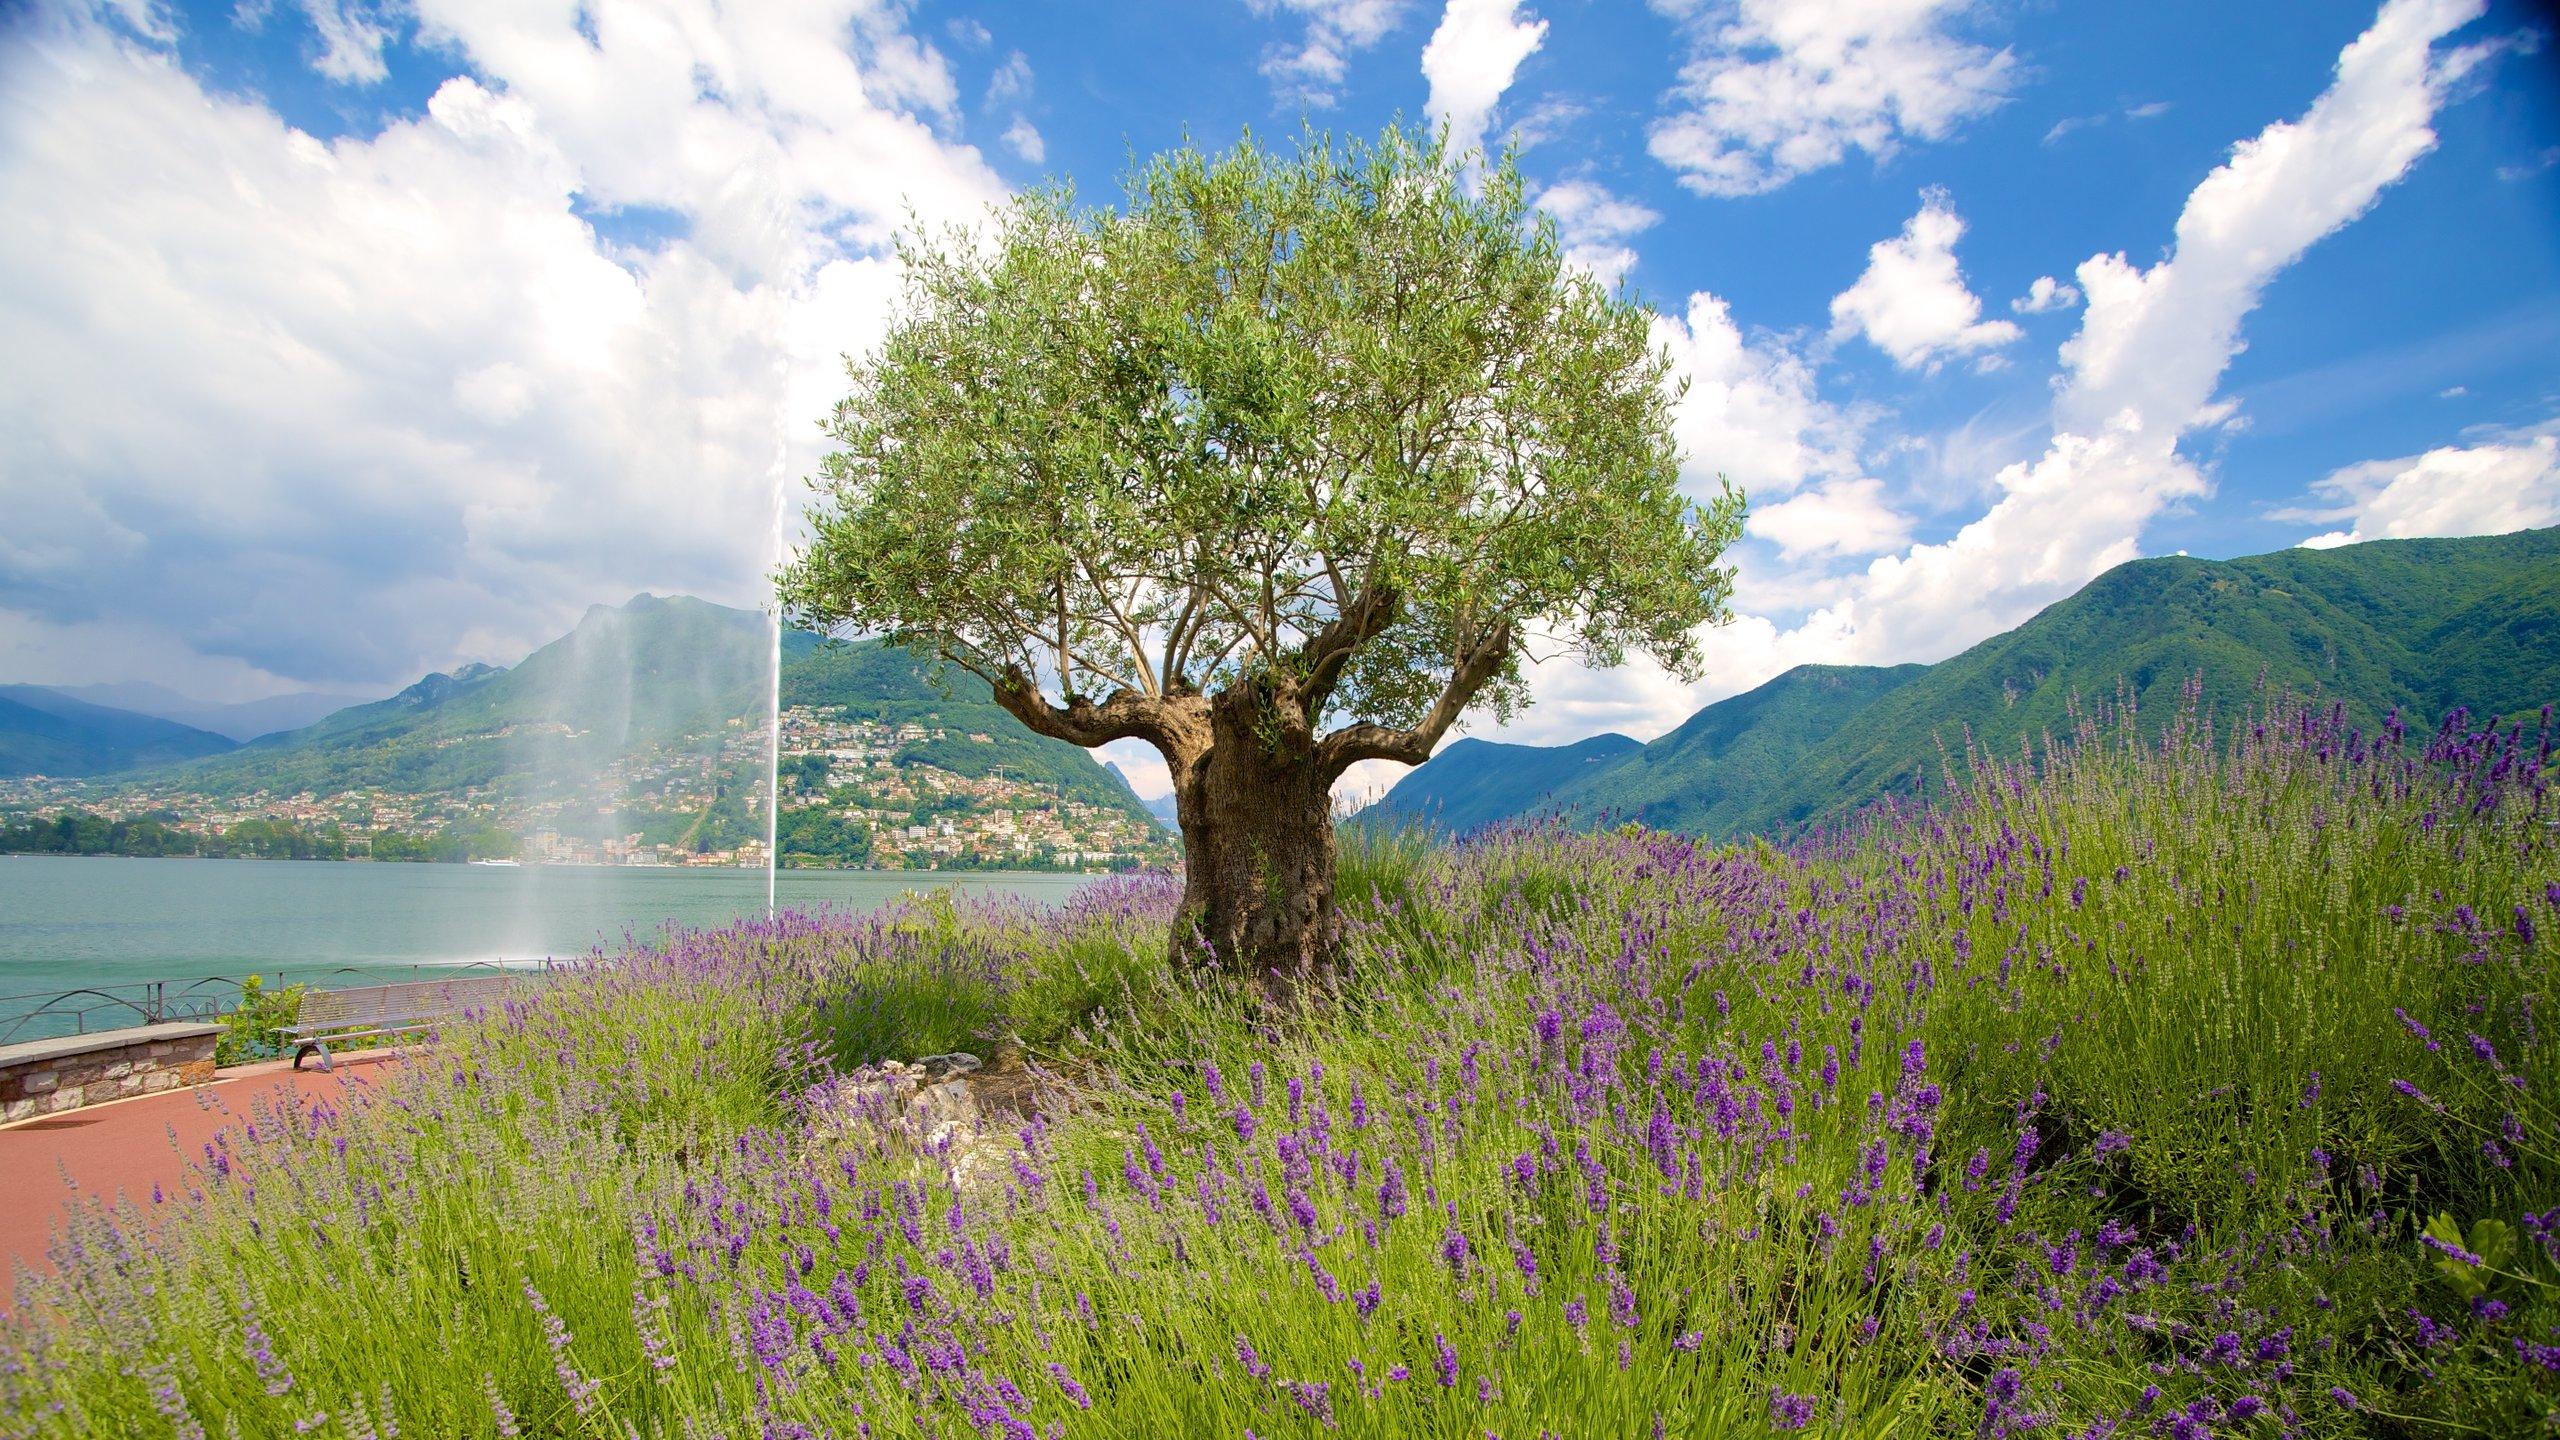 Cassarate, Canton of Ticino, Switzerland